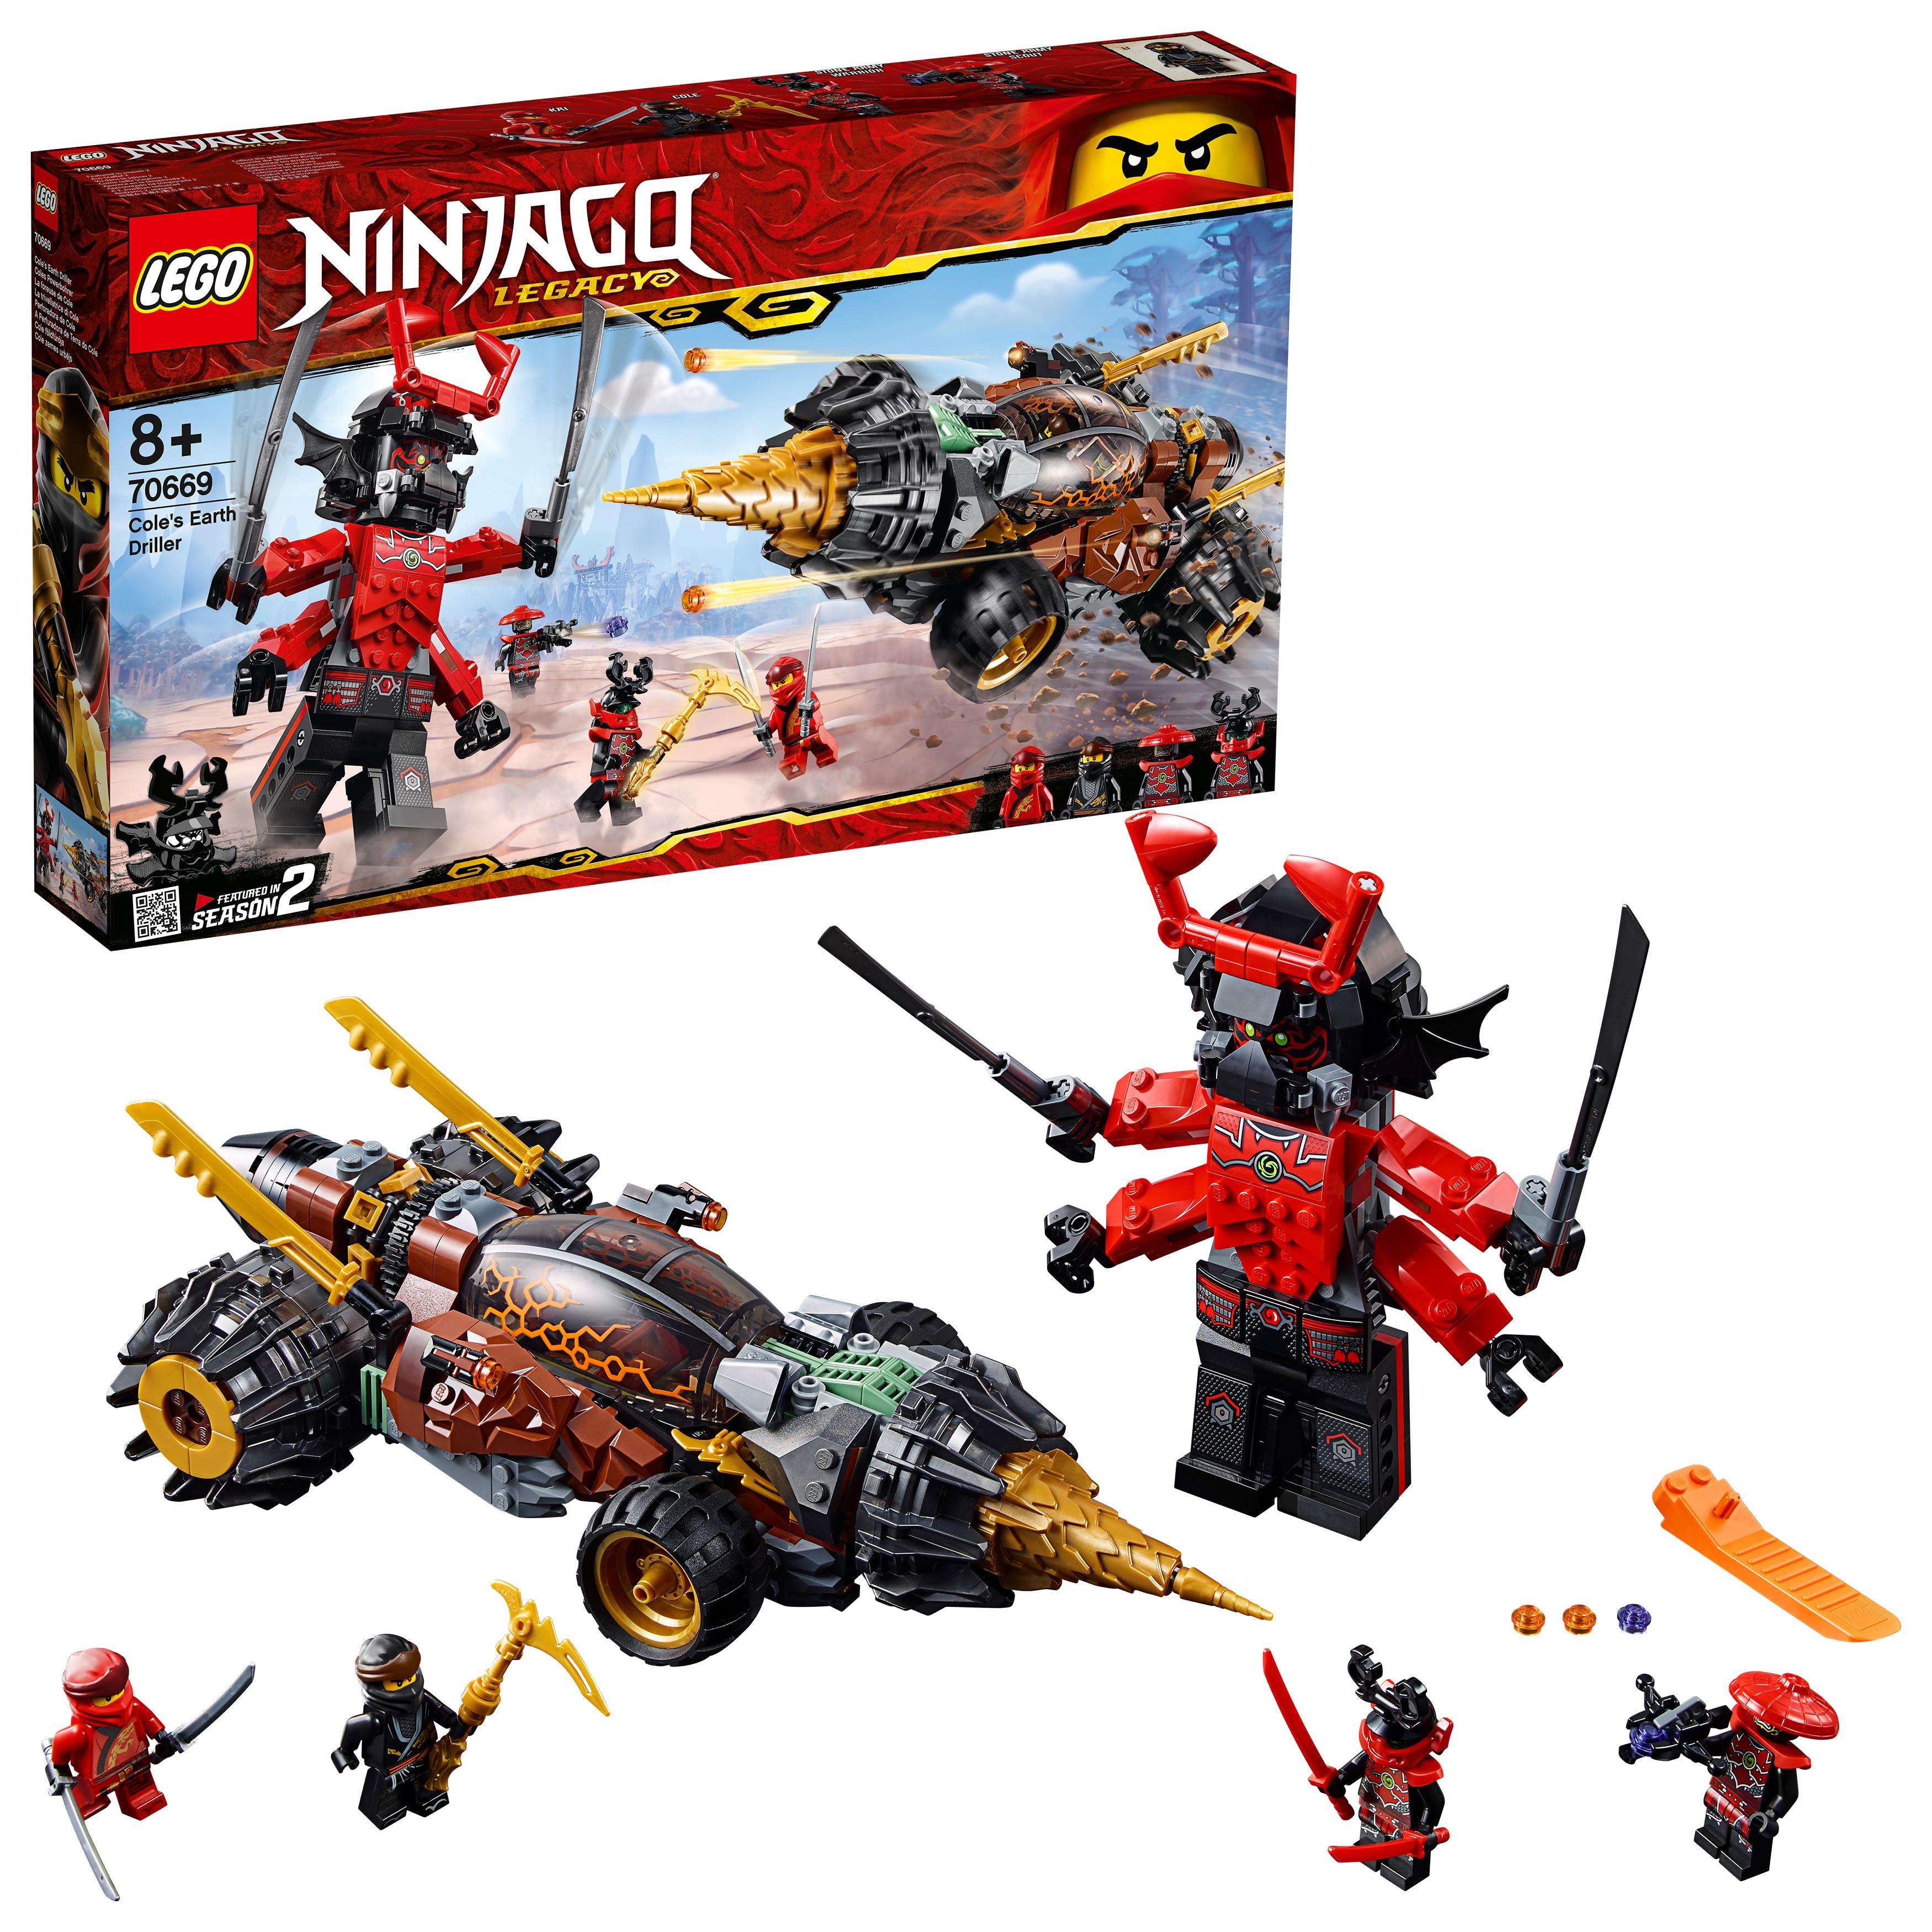 buy lego ninjago  cole's earth driller 70669